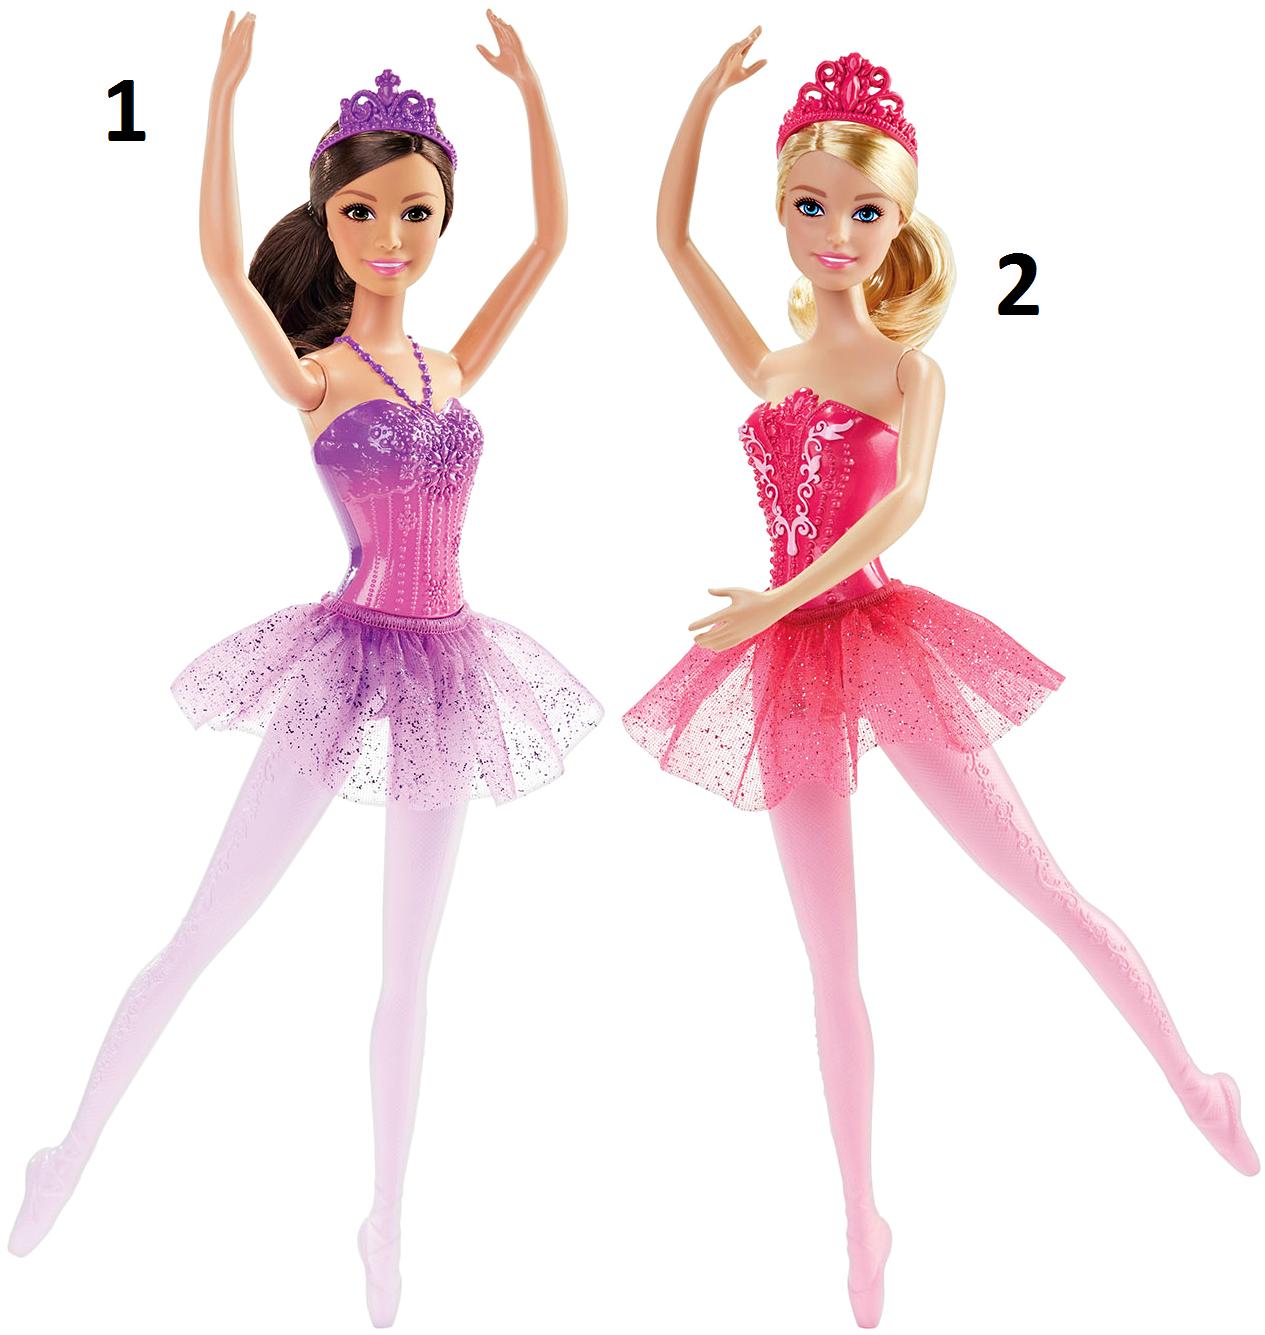 Купить Кукла Barbie® Балерина, 2 вида